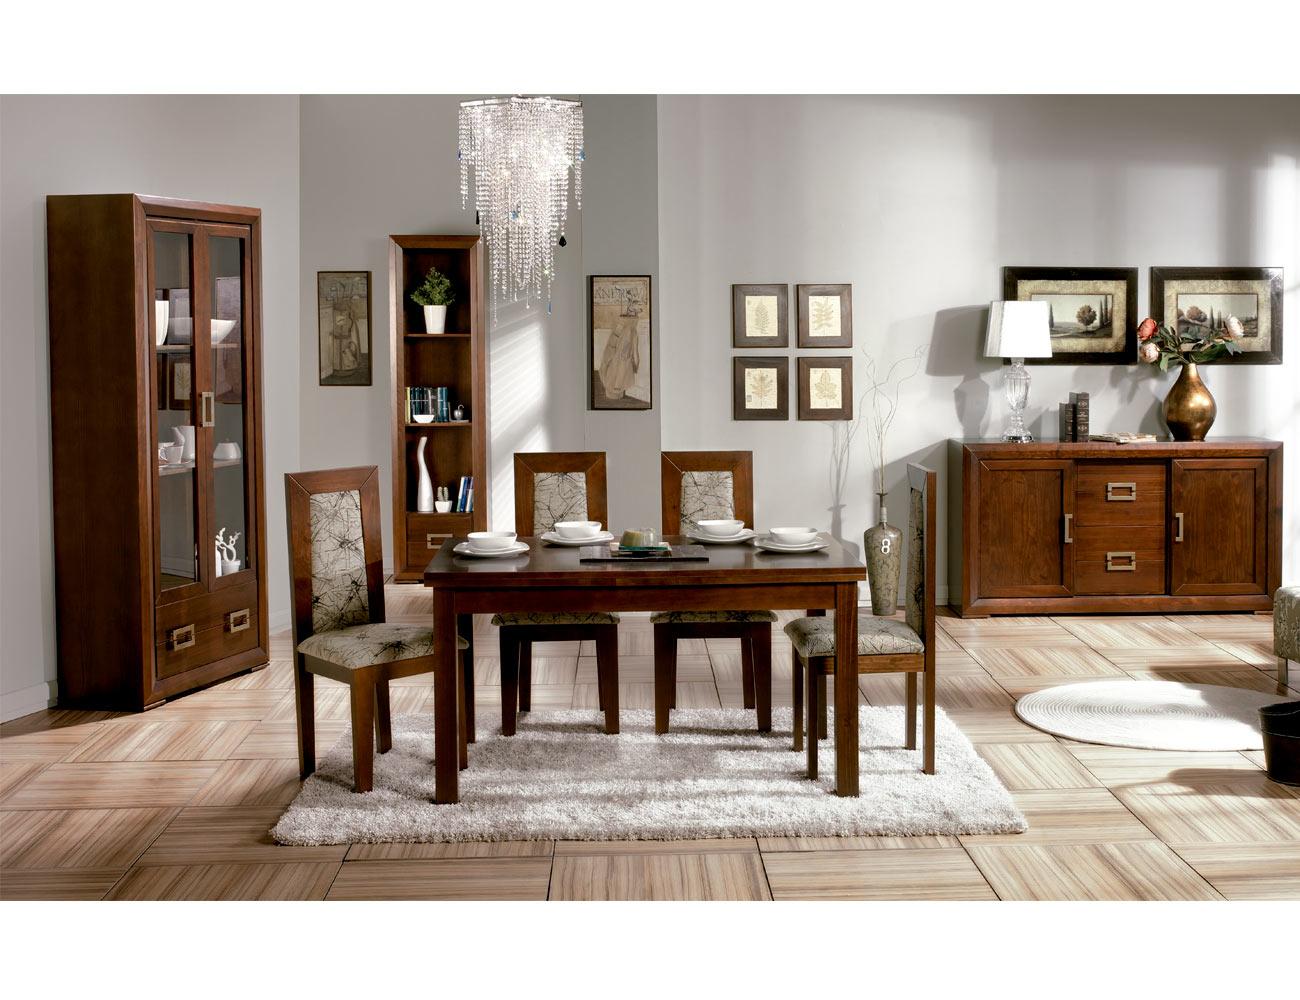 Composicion34 mueble salon comedor madera5